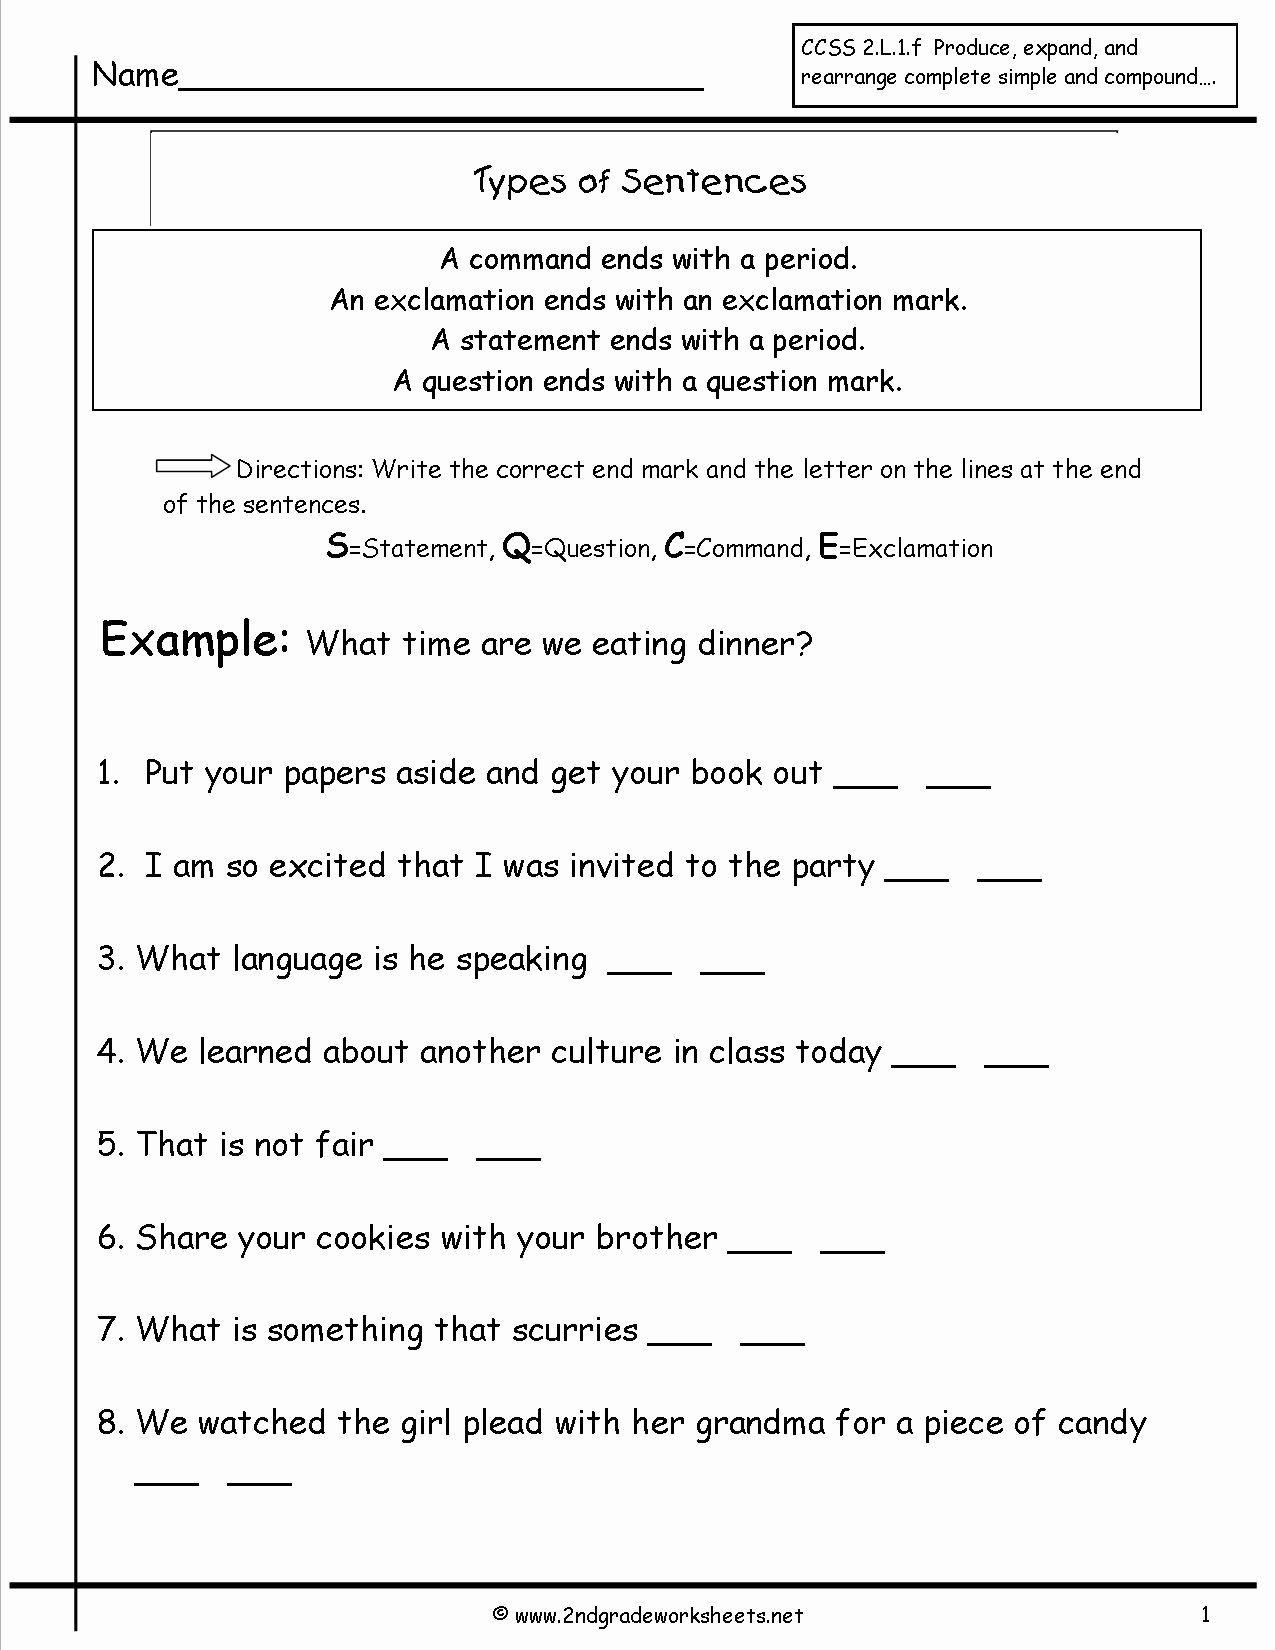 Types Of Sentences Worksheet Elegant Second Grade